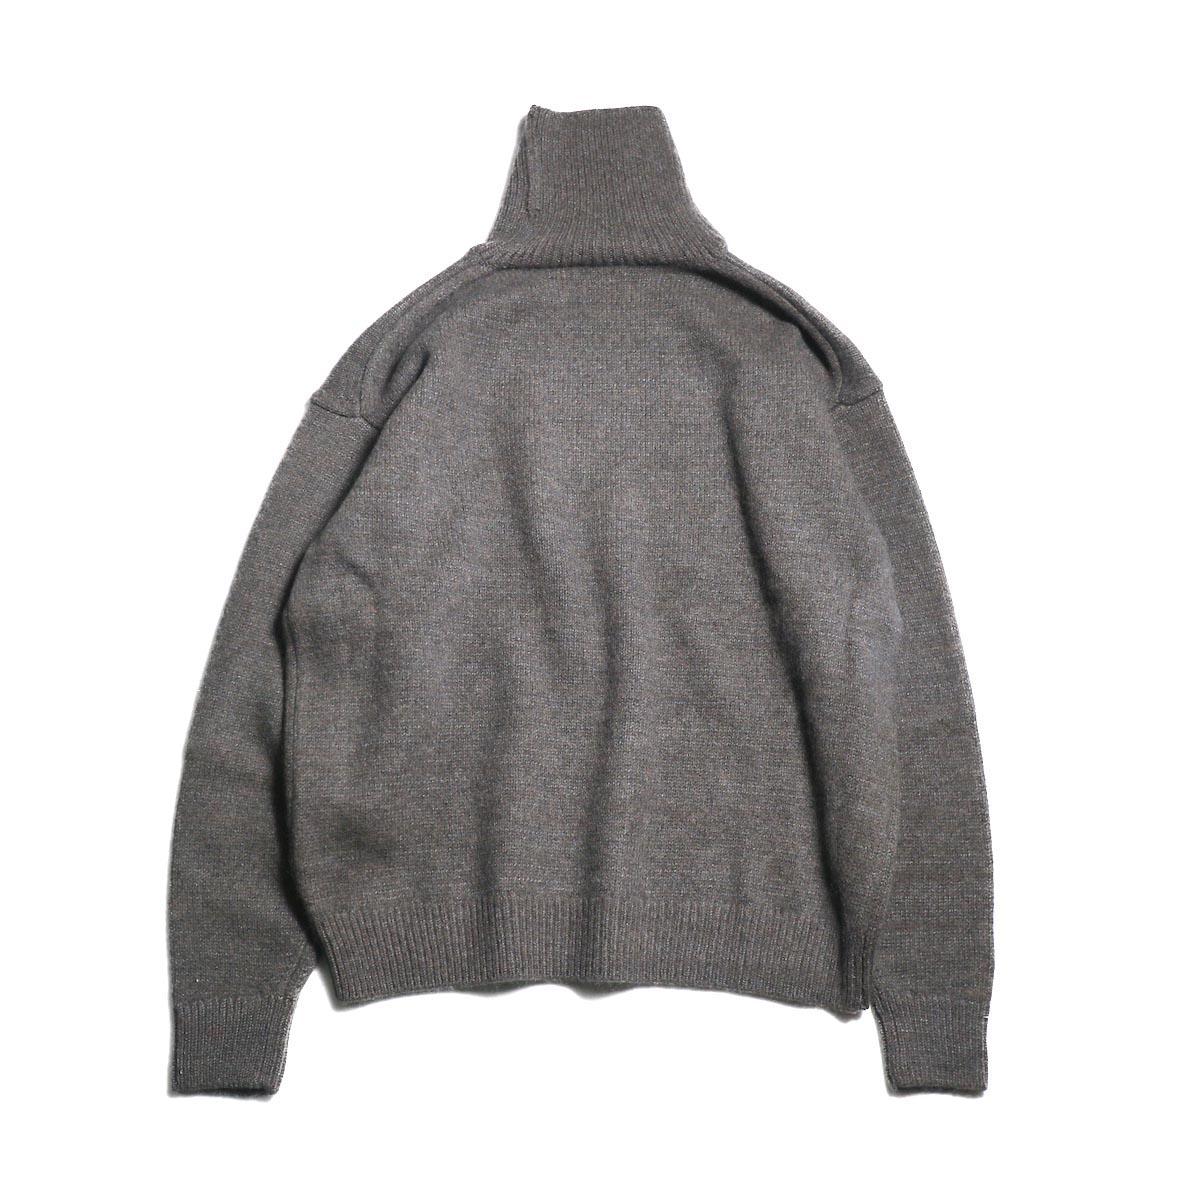 blurhms / Silk Mohair Wool Knit Turtle-Neck P/O (H.Brown)背面